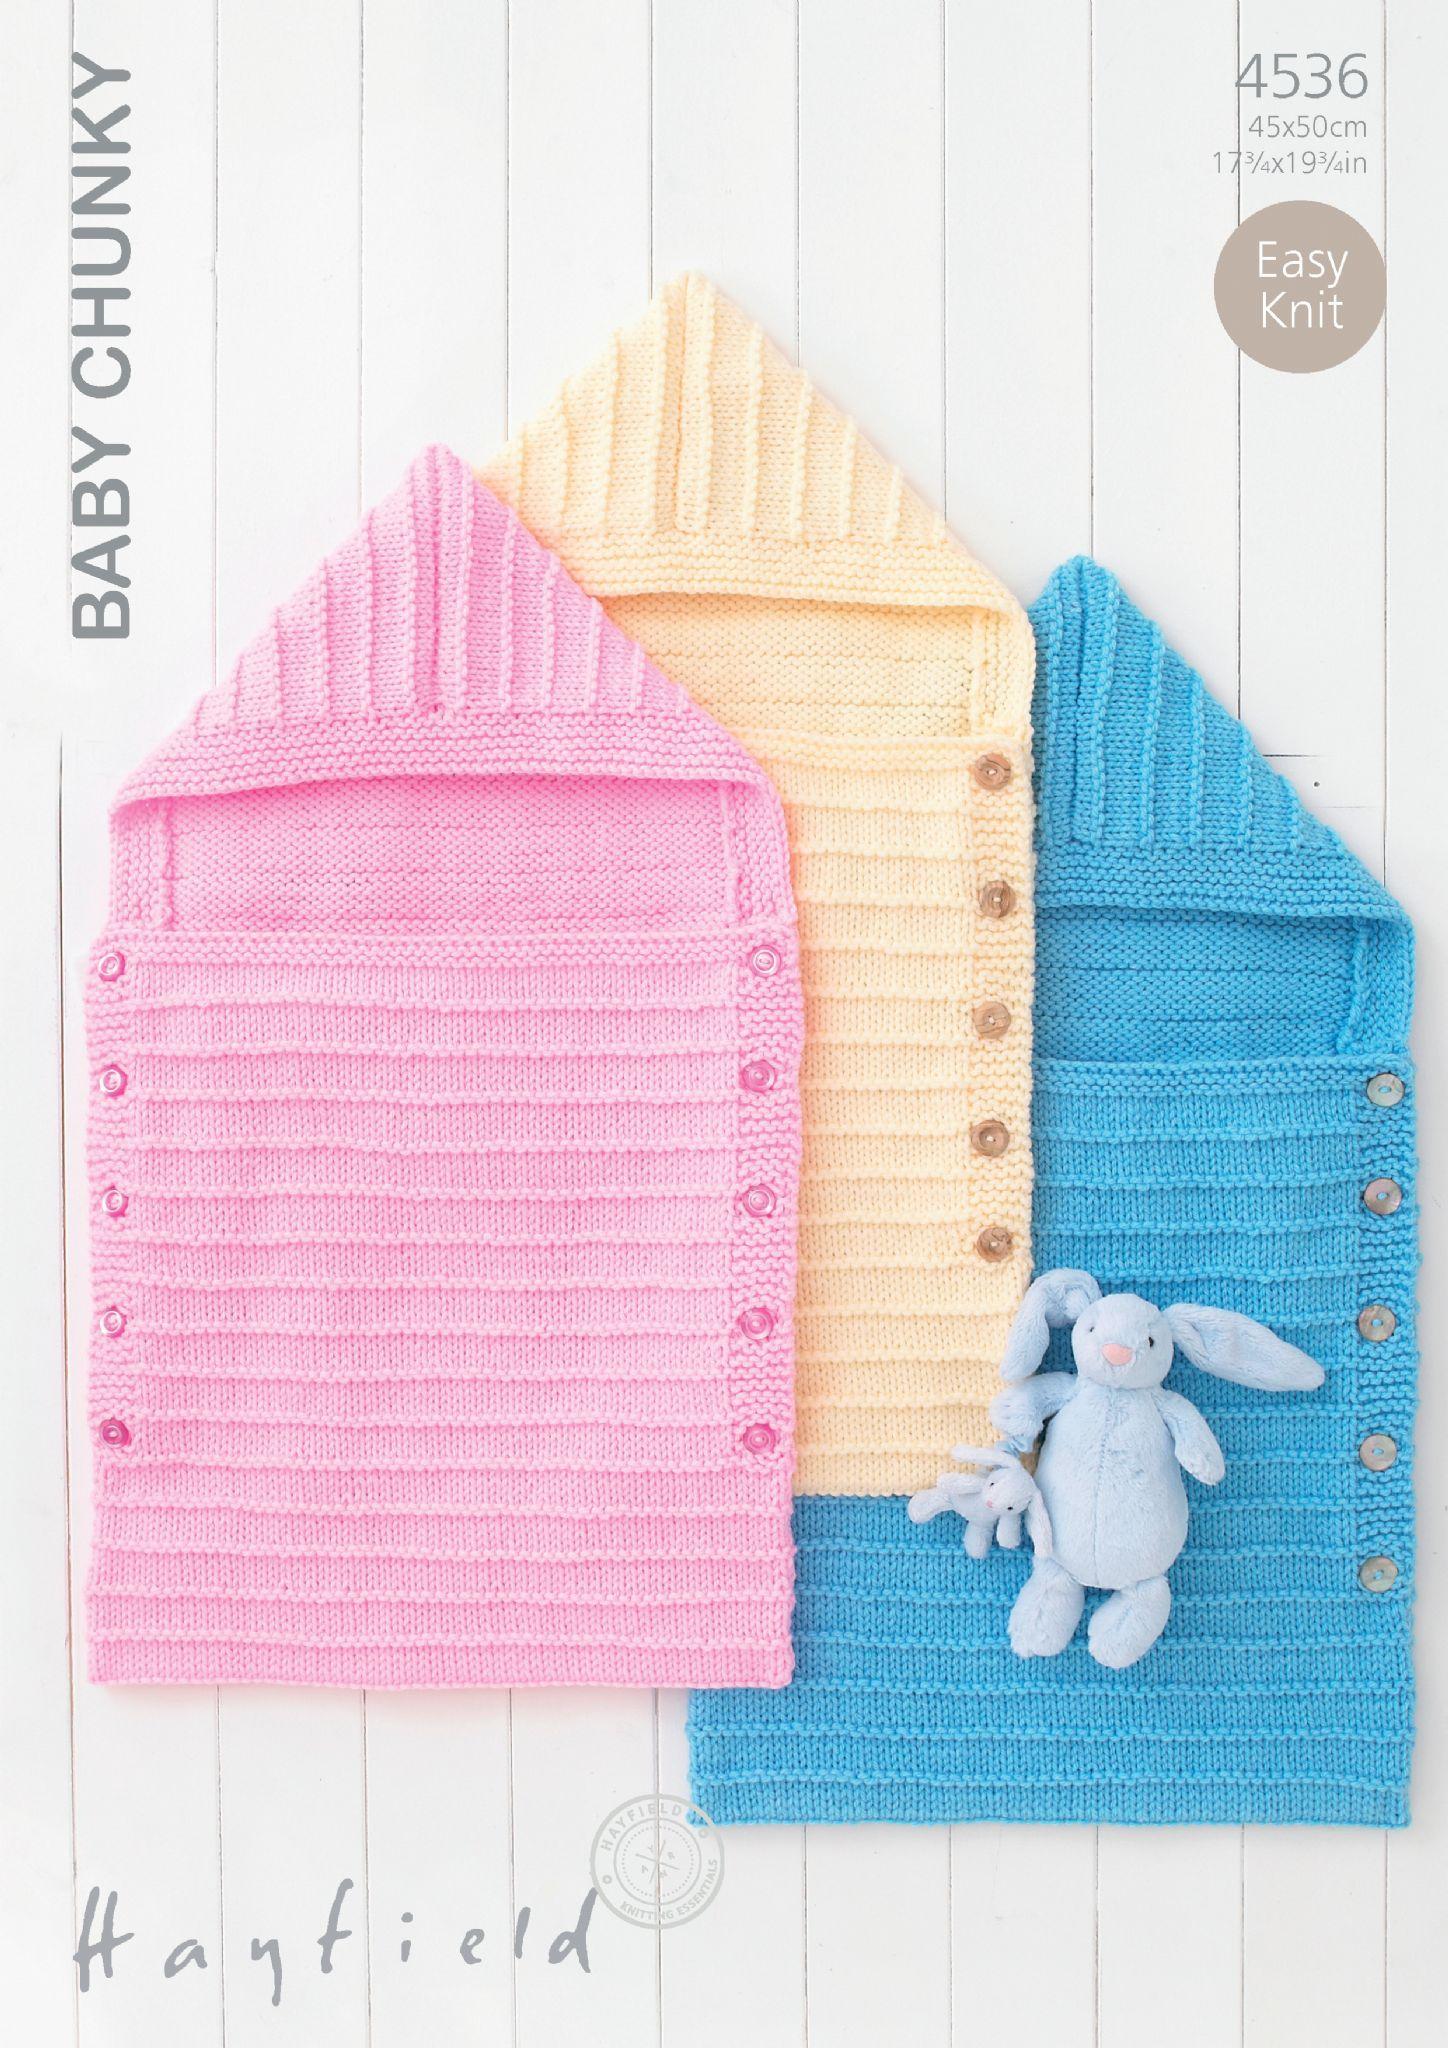 4536 Hayfield Baby Chunky Easy Knit Sleeping Bag Knitting Pattern